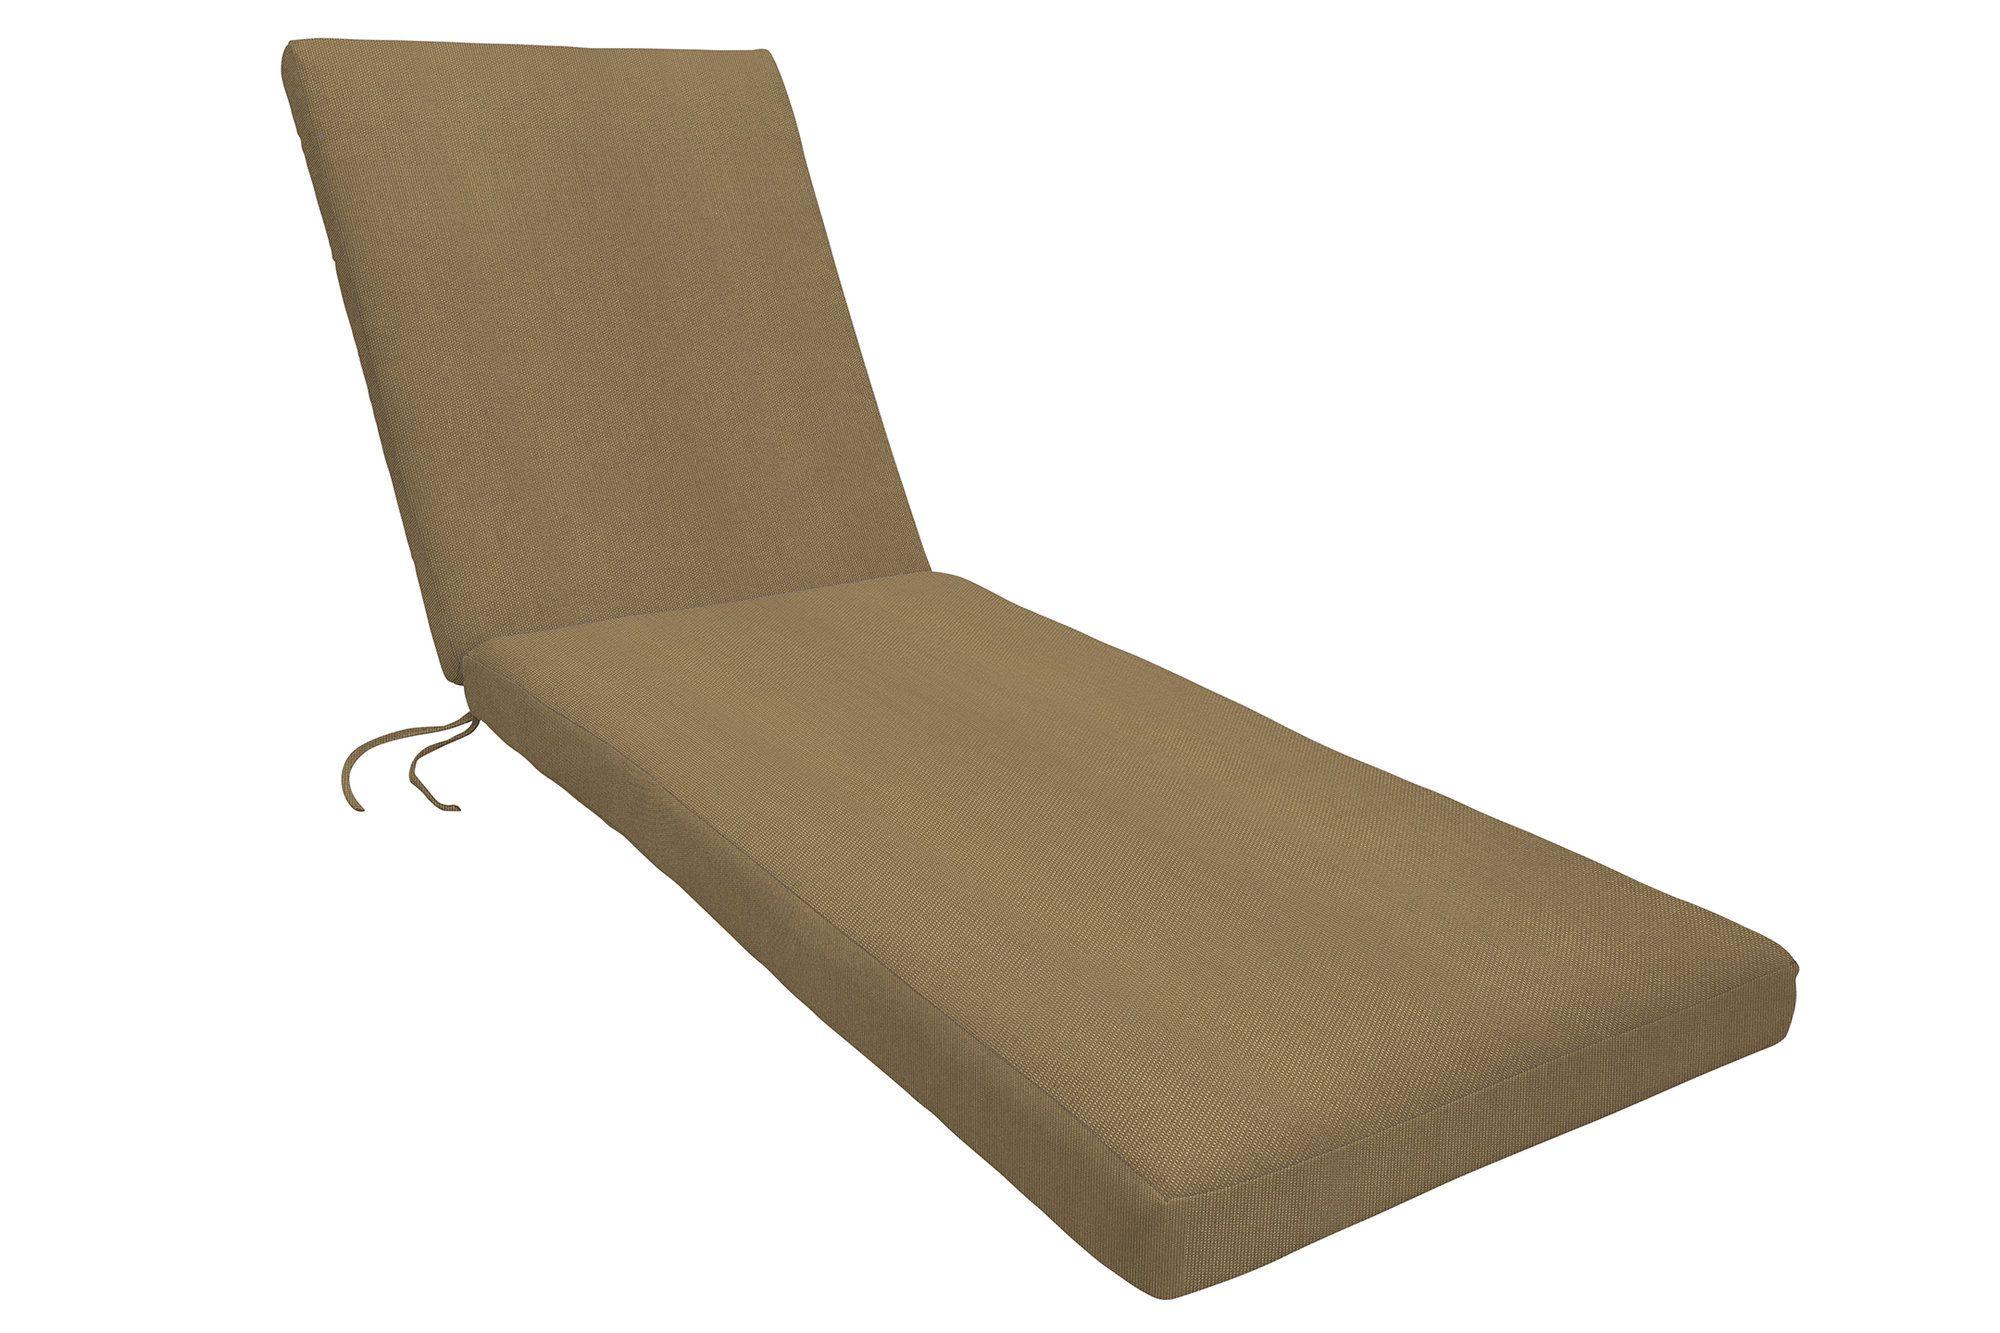 Sunbrella Chaise Lounge Cushion Replacement cushions